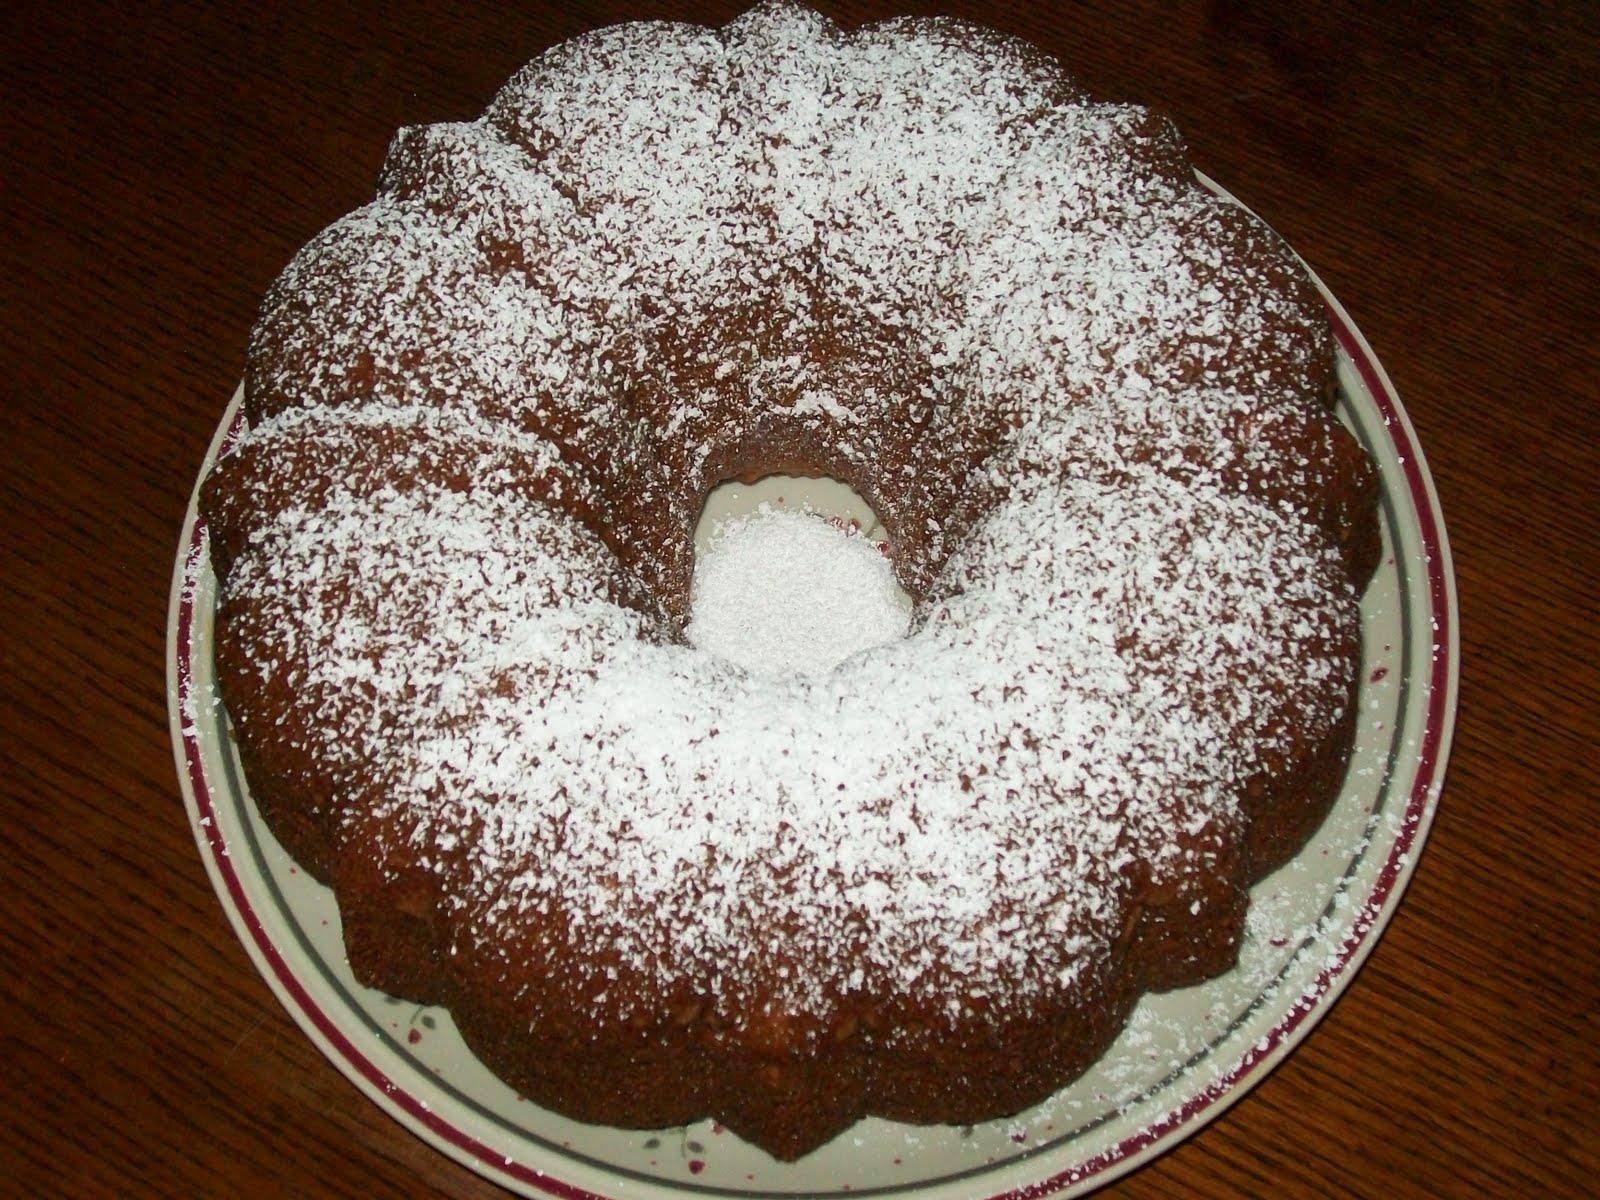 Michigan Cottage Cook: VIRGINIA BUDD'S SHERRY WINE CAKE